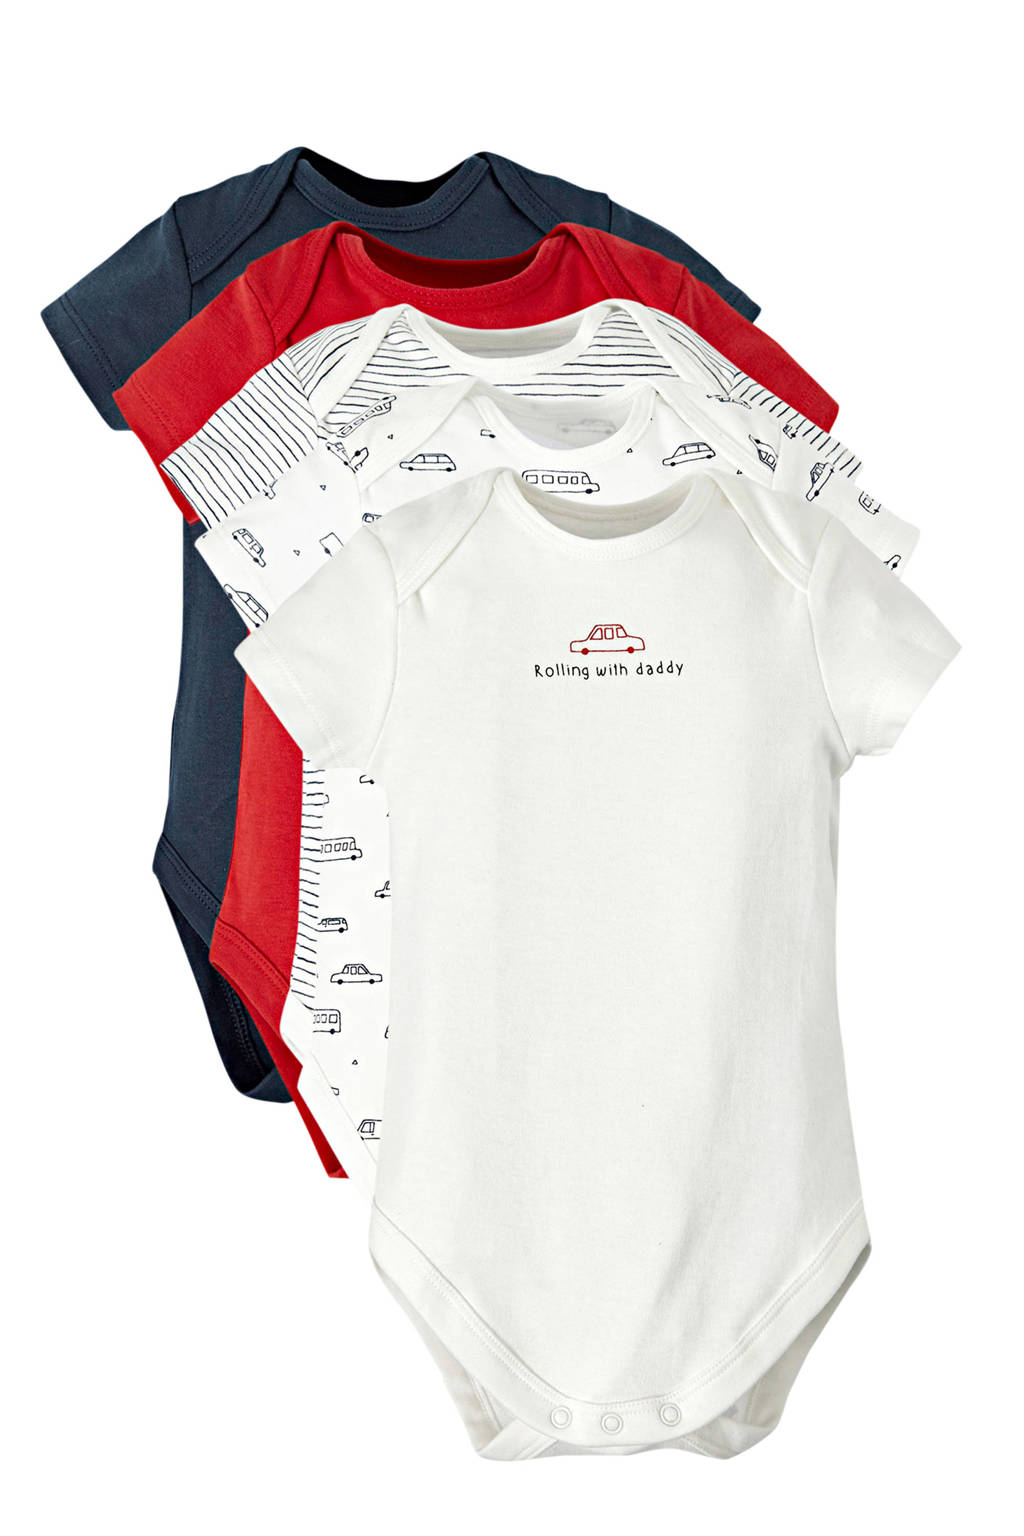 C&A Baby Club romper - set van 5 wit/rood/blauw, Wit/rood/blauw